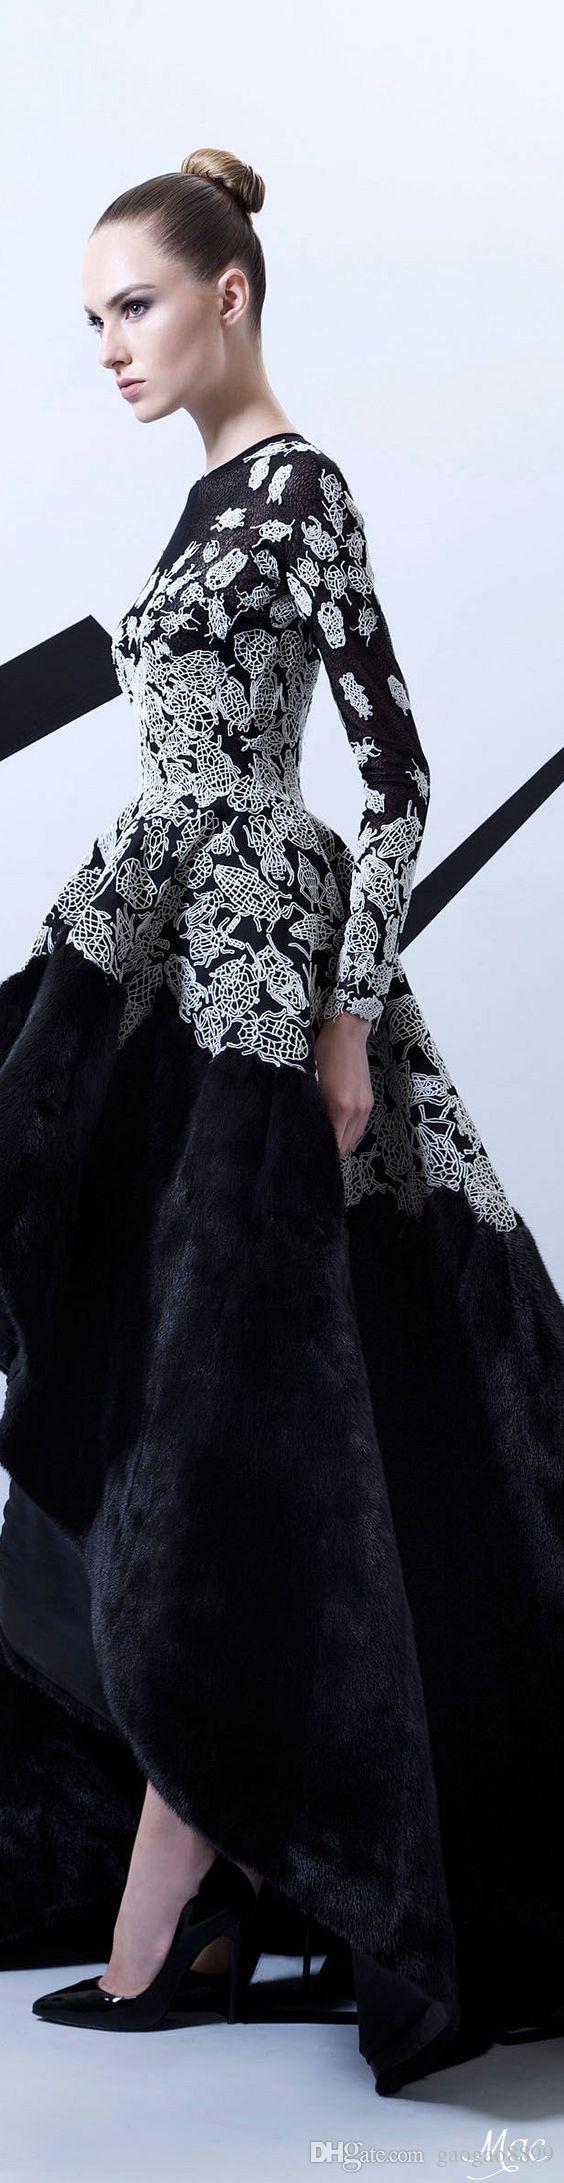 Rami Kadi 2016 Spring Amazing Lace Embroidery Velvet Long Sleeve Evening Dresses High Low Ball Gown Prom Dresses Custom Make